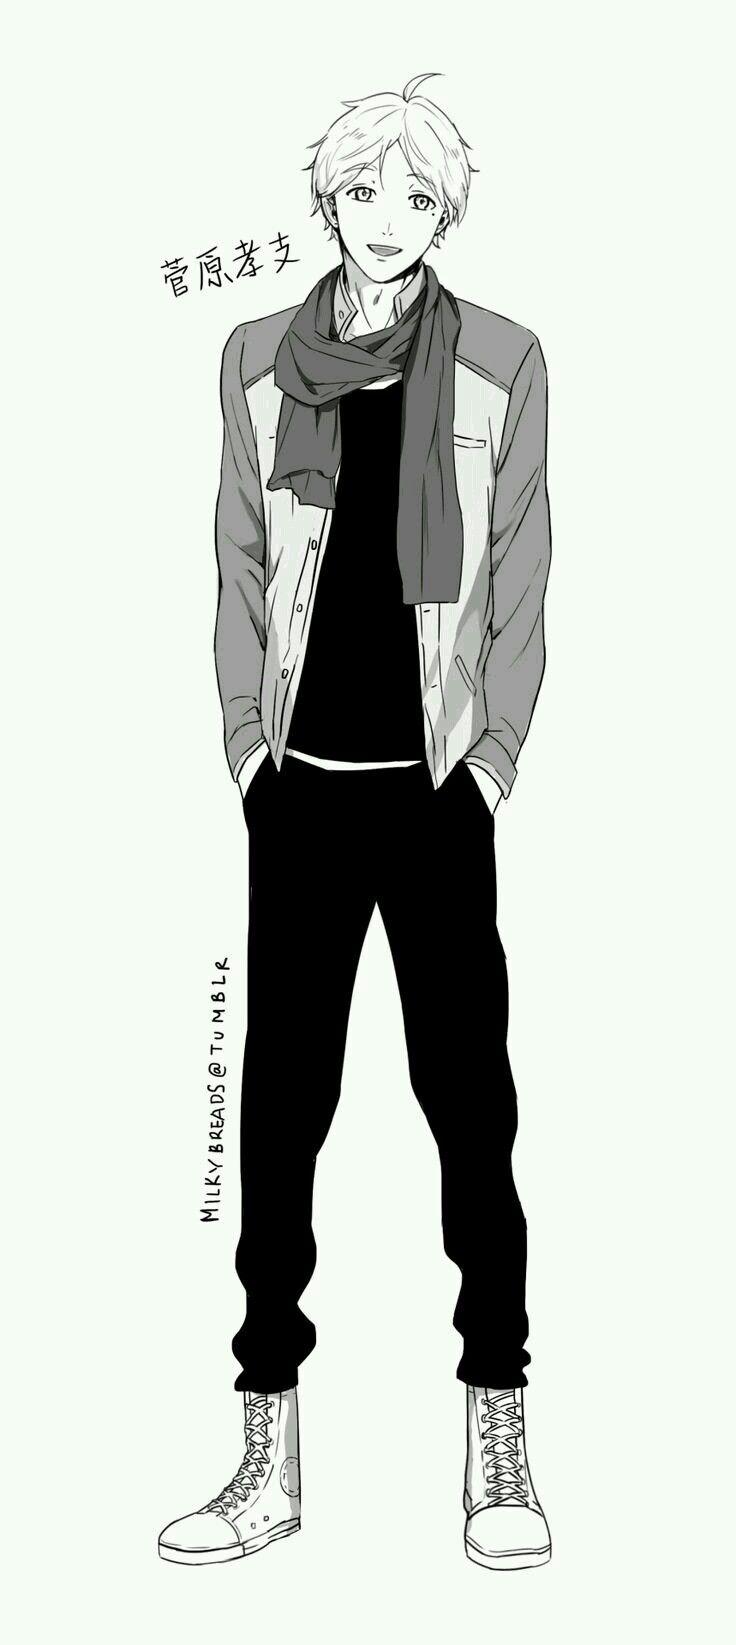 Pin By Rachel Tennyson On Clothing Casual Anime Guys Anime Haikyuu